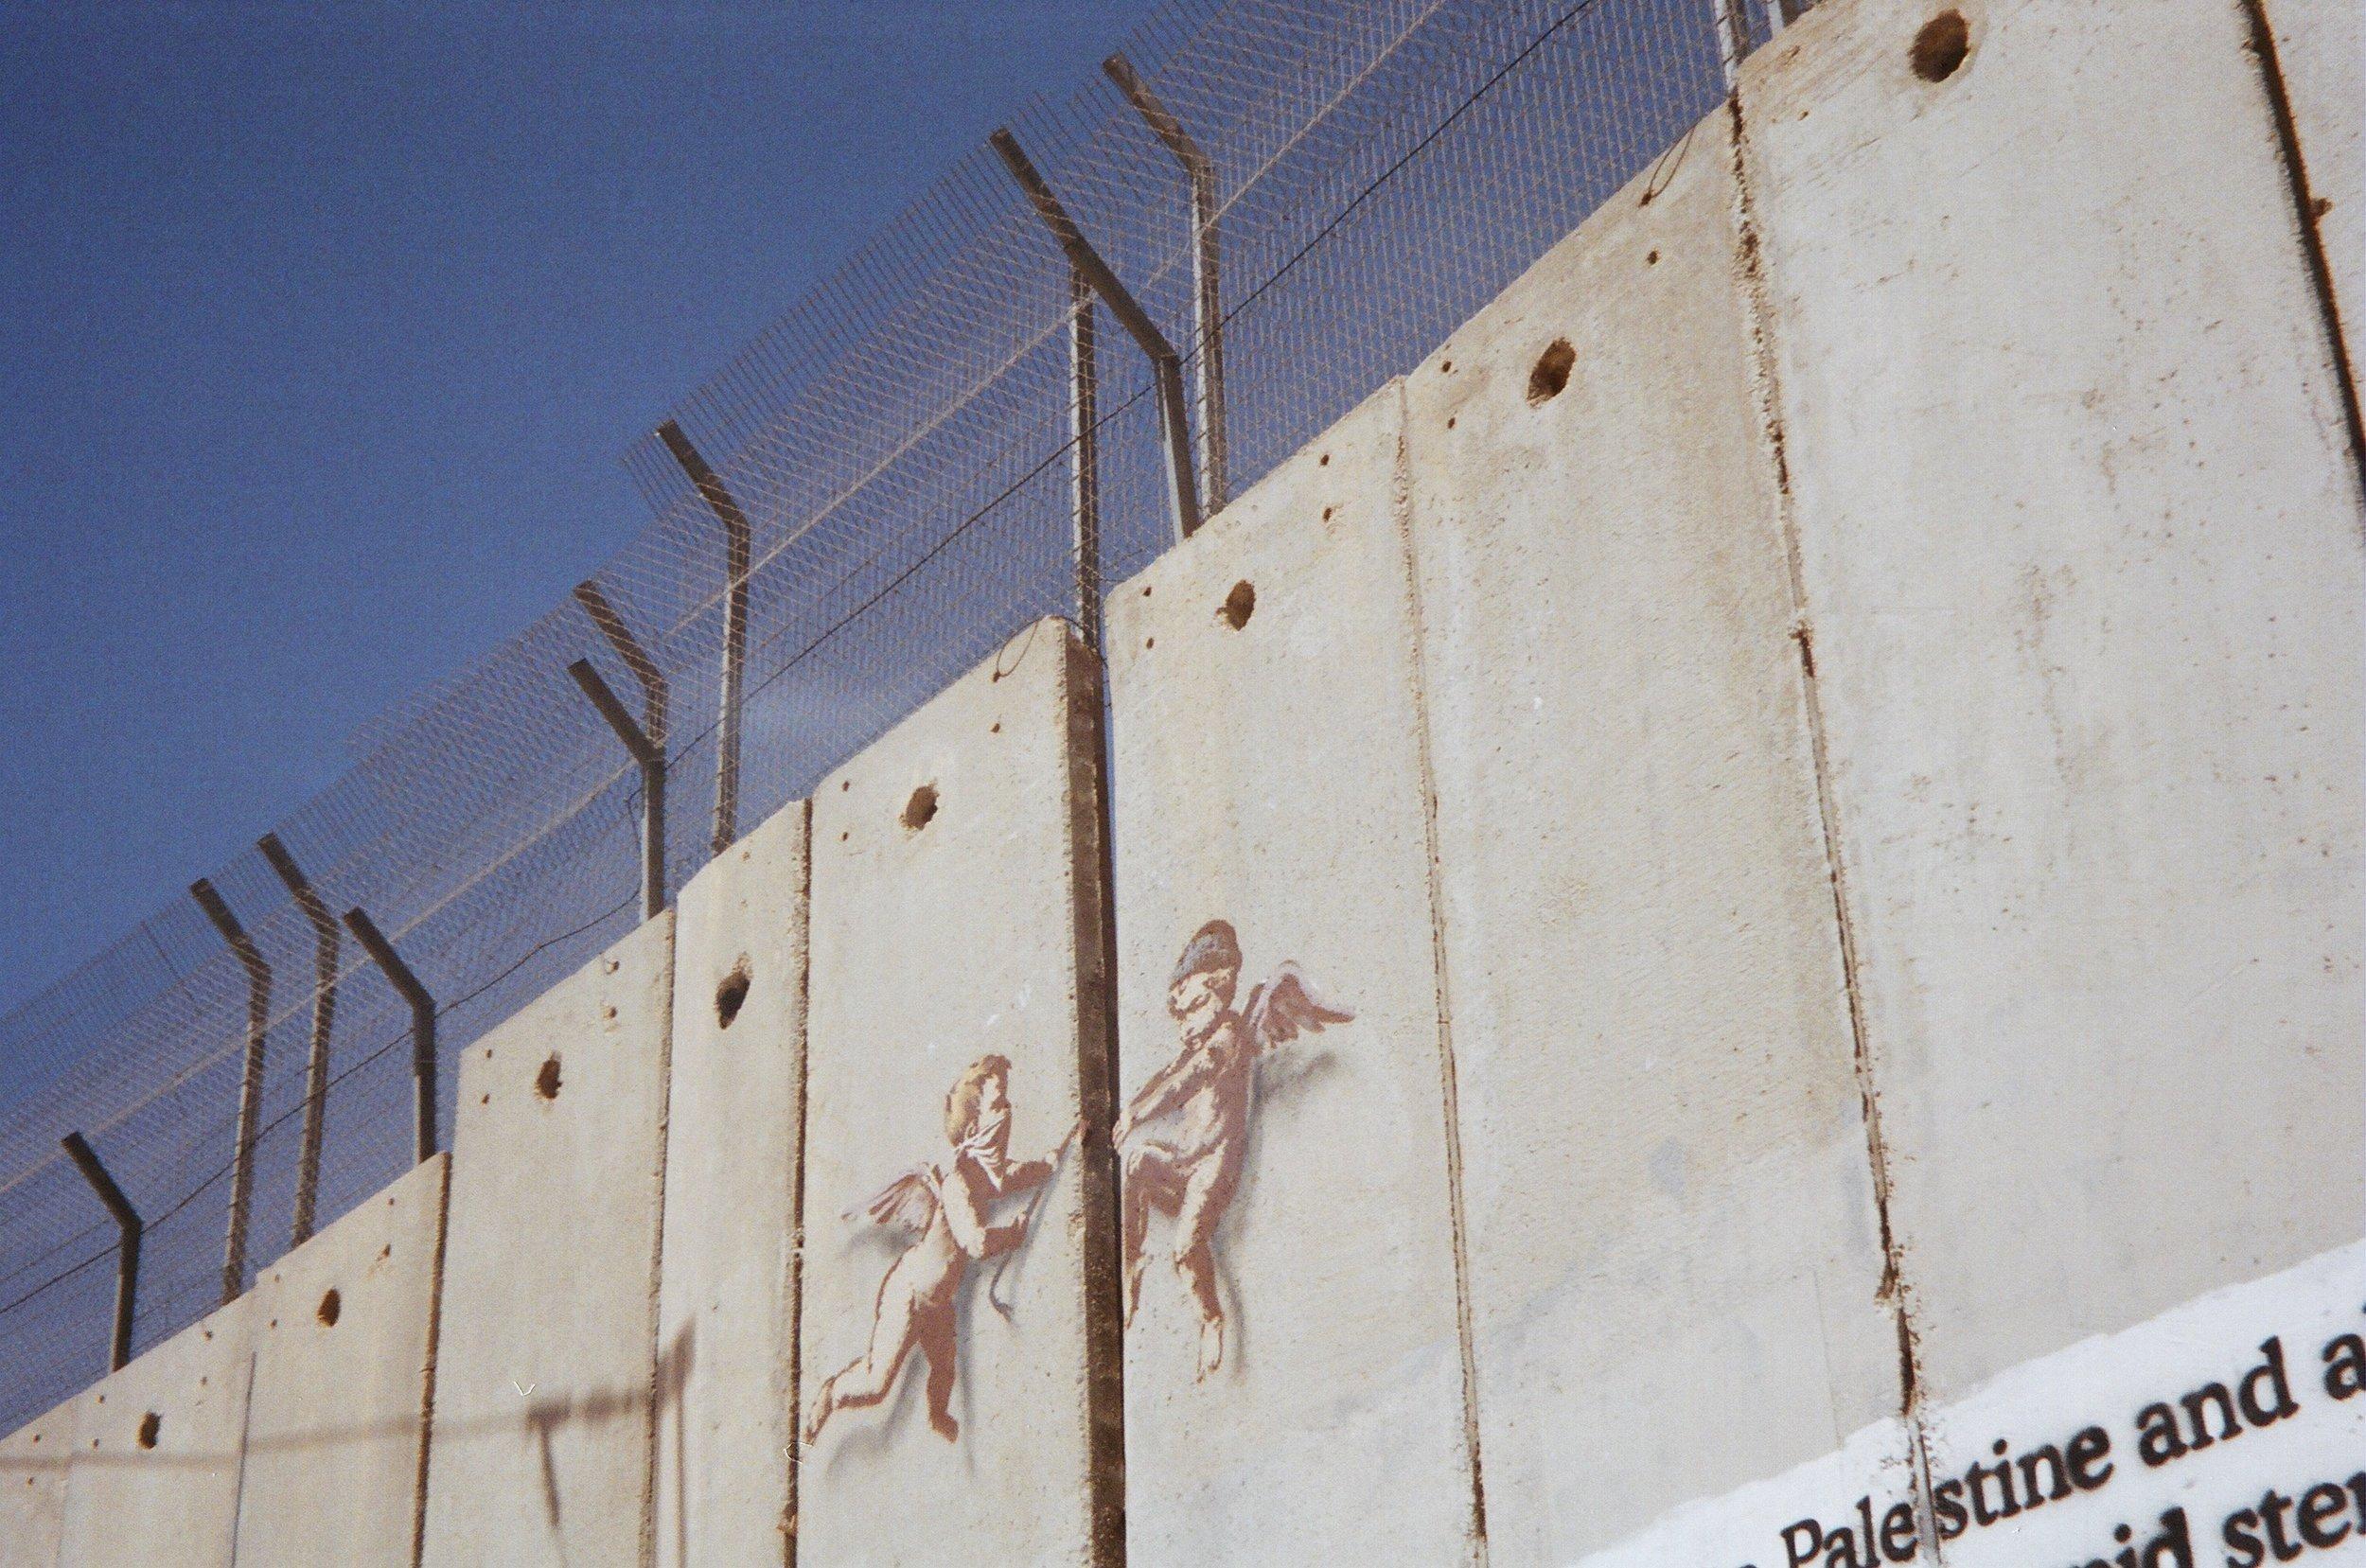 Palestinian Courage - Bethlehem | James Cabraal